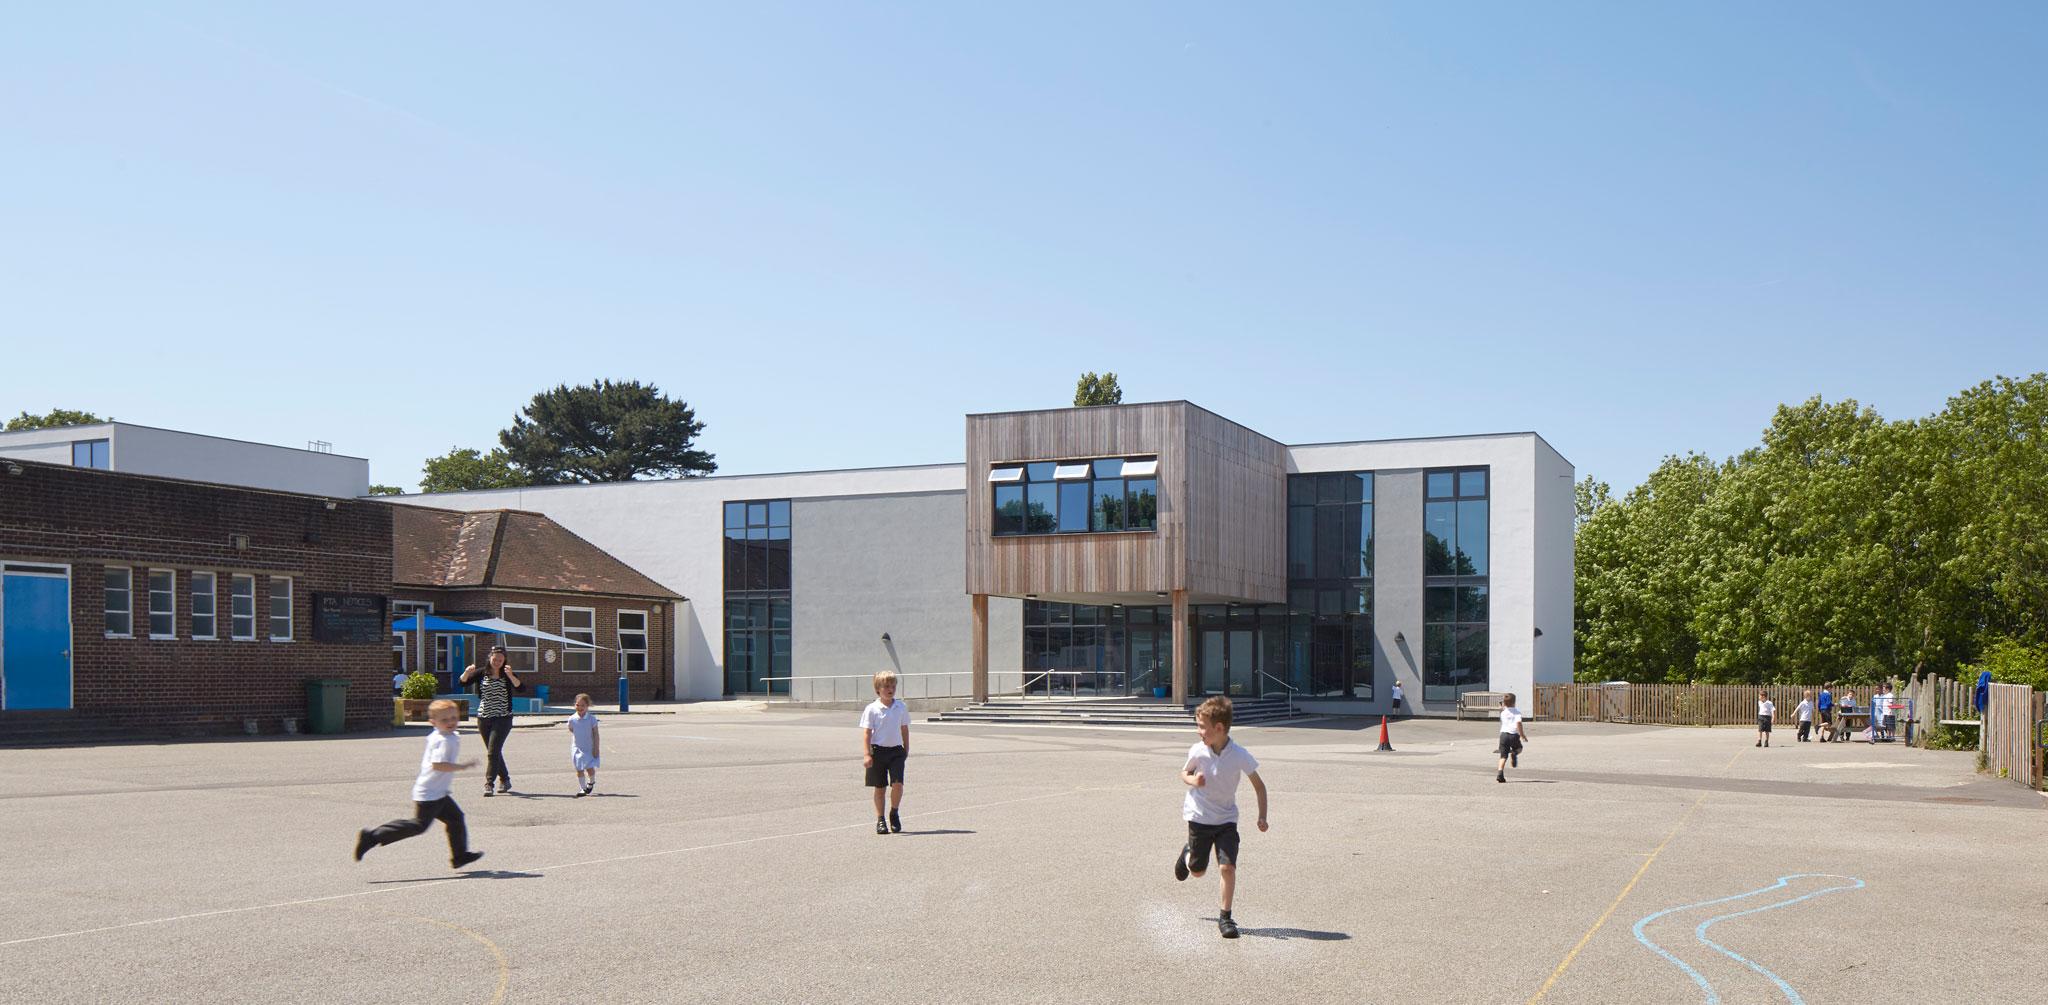 Branfil Primary School